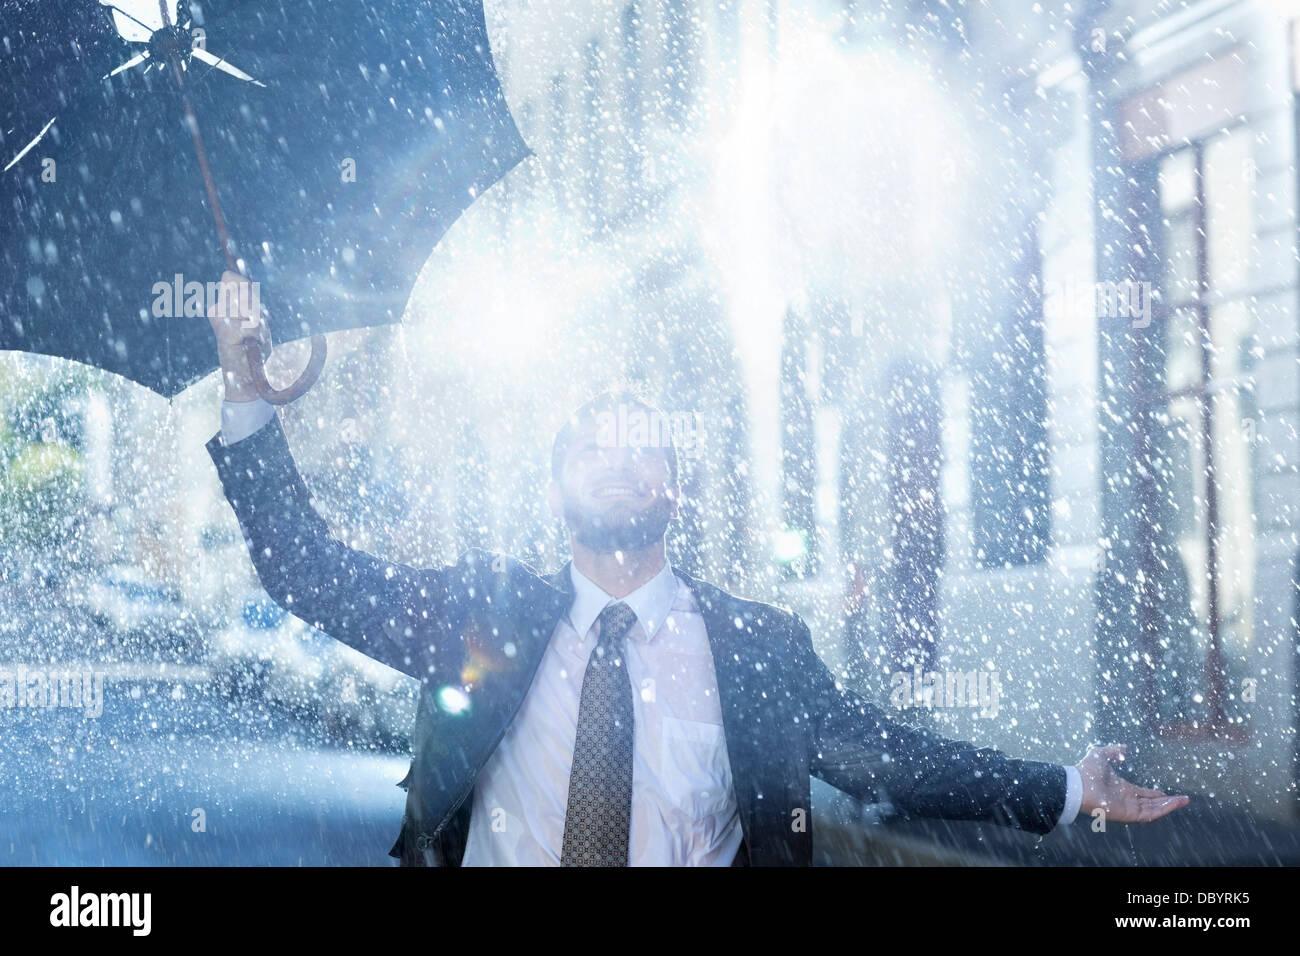 Enthusiastic man with broken umbrella in rain Stock Photo